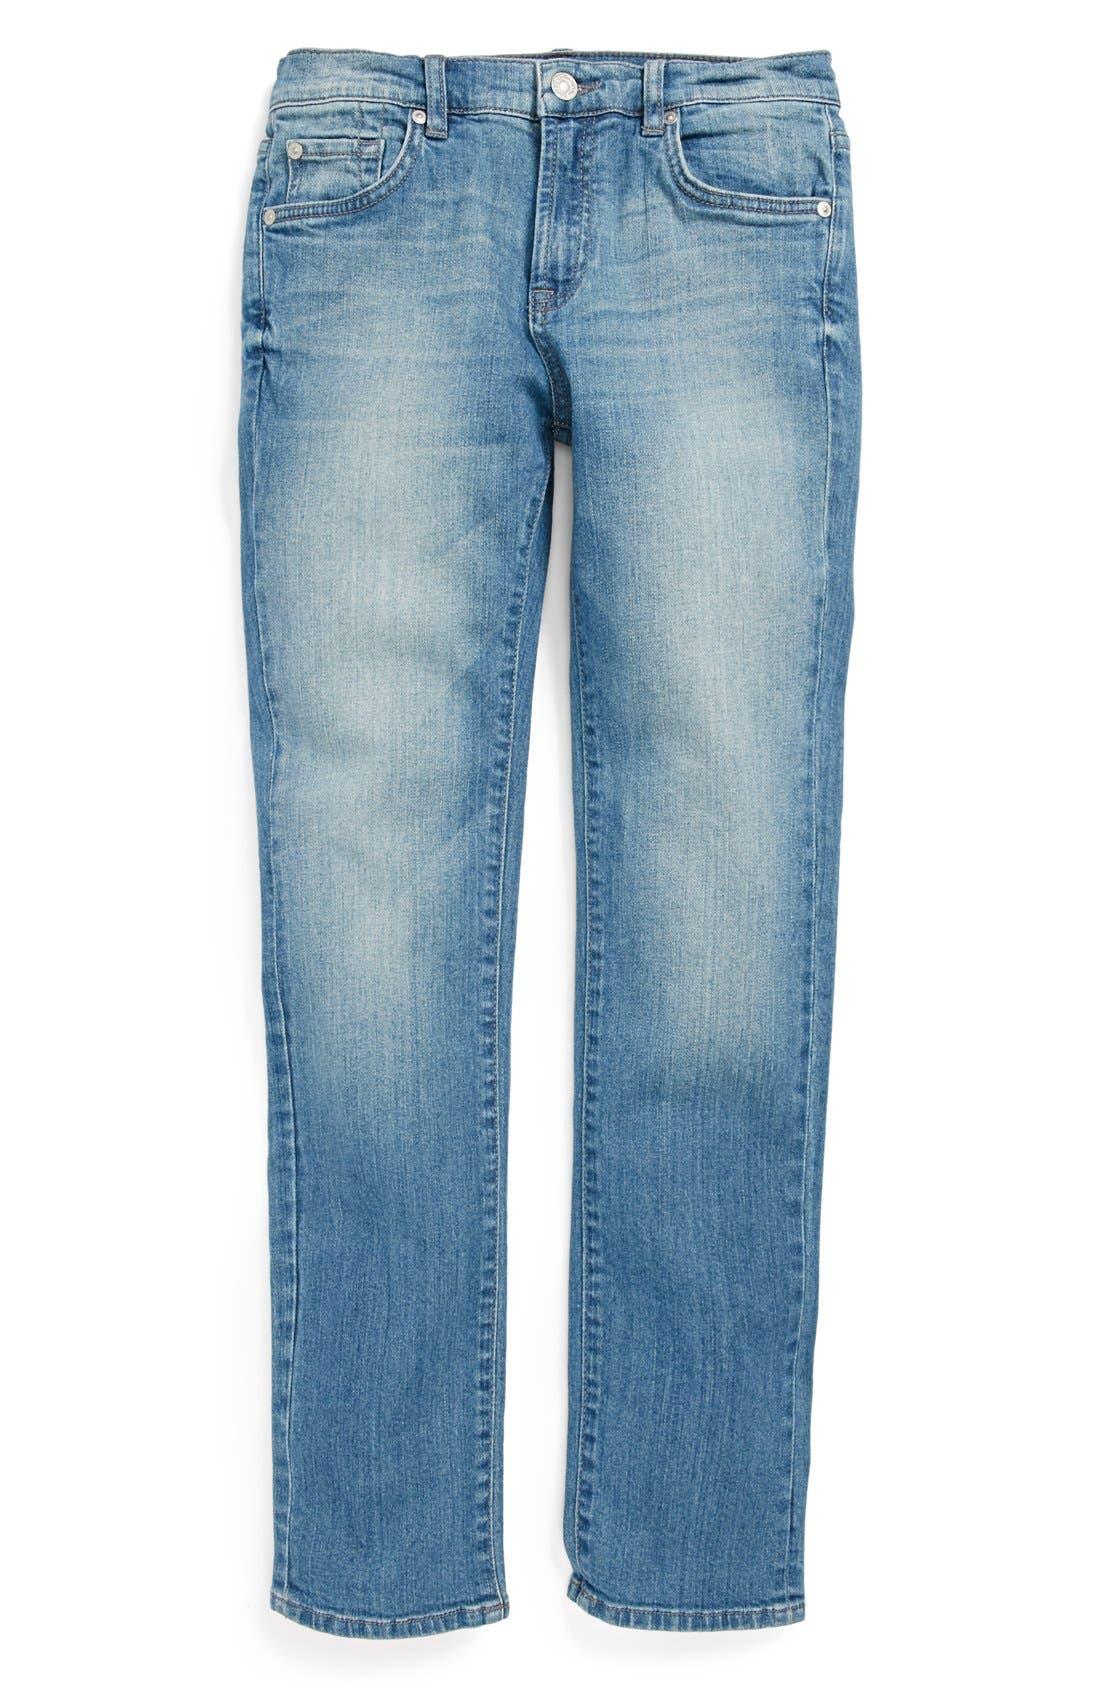 Alternate Image 2  - 7 For All Mankind® 'Slimmy' Slim Fit Jeans (Big Boys)